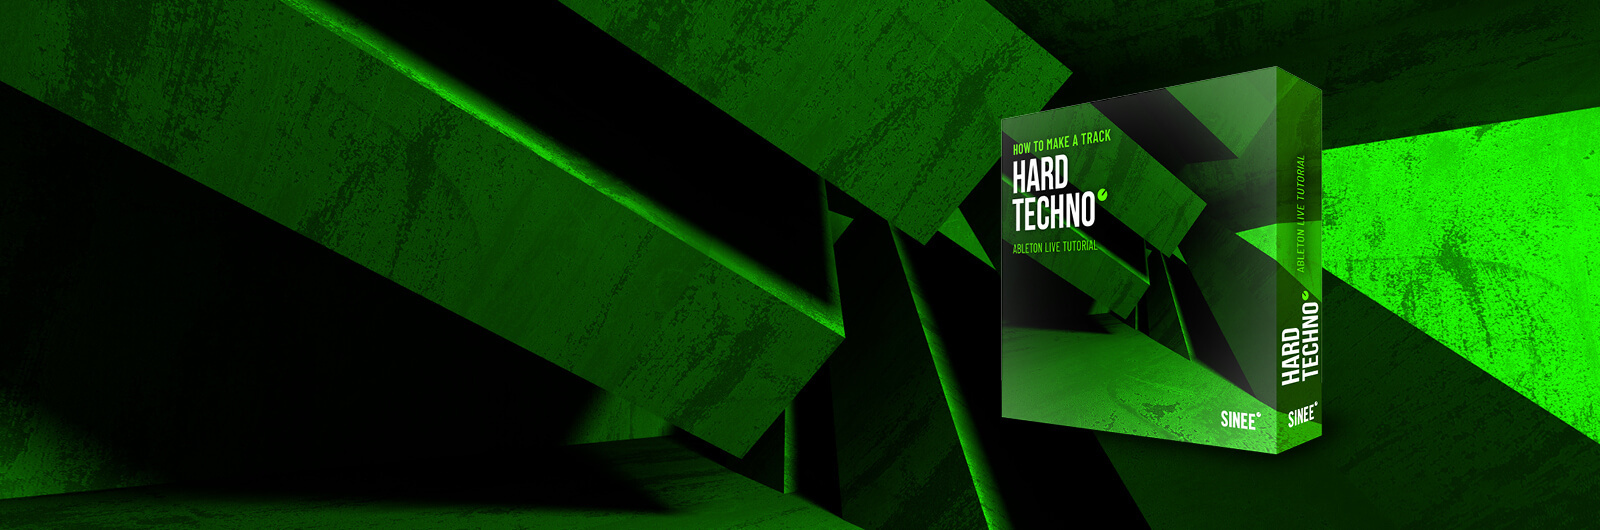 Sinee-Header-Hard-Techno-06-2020